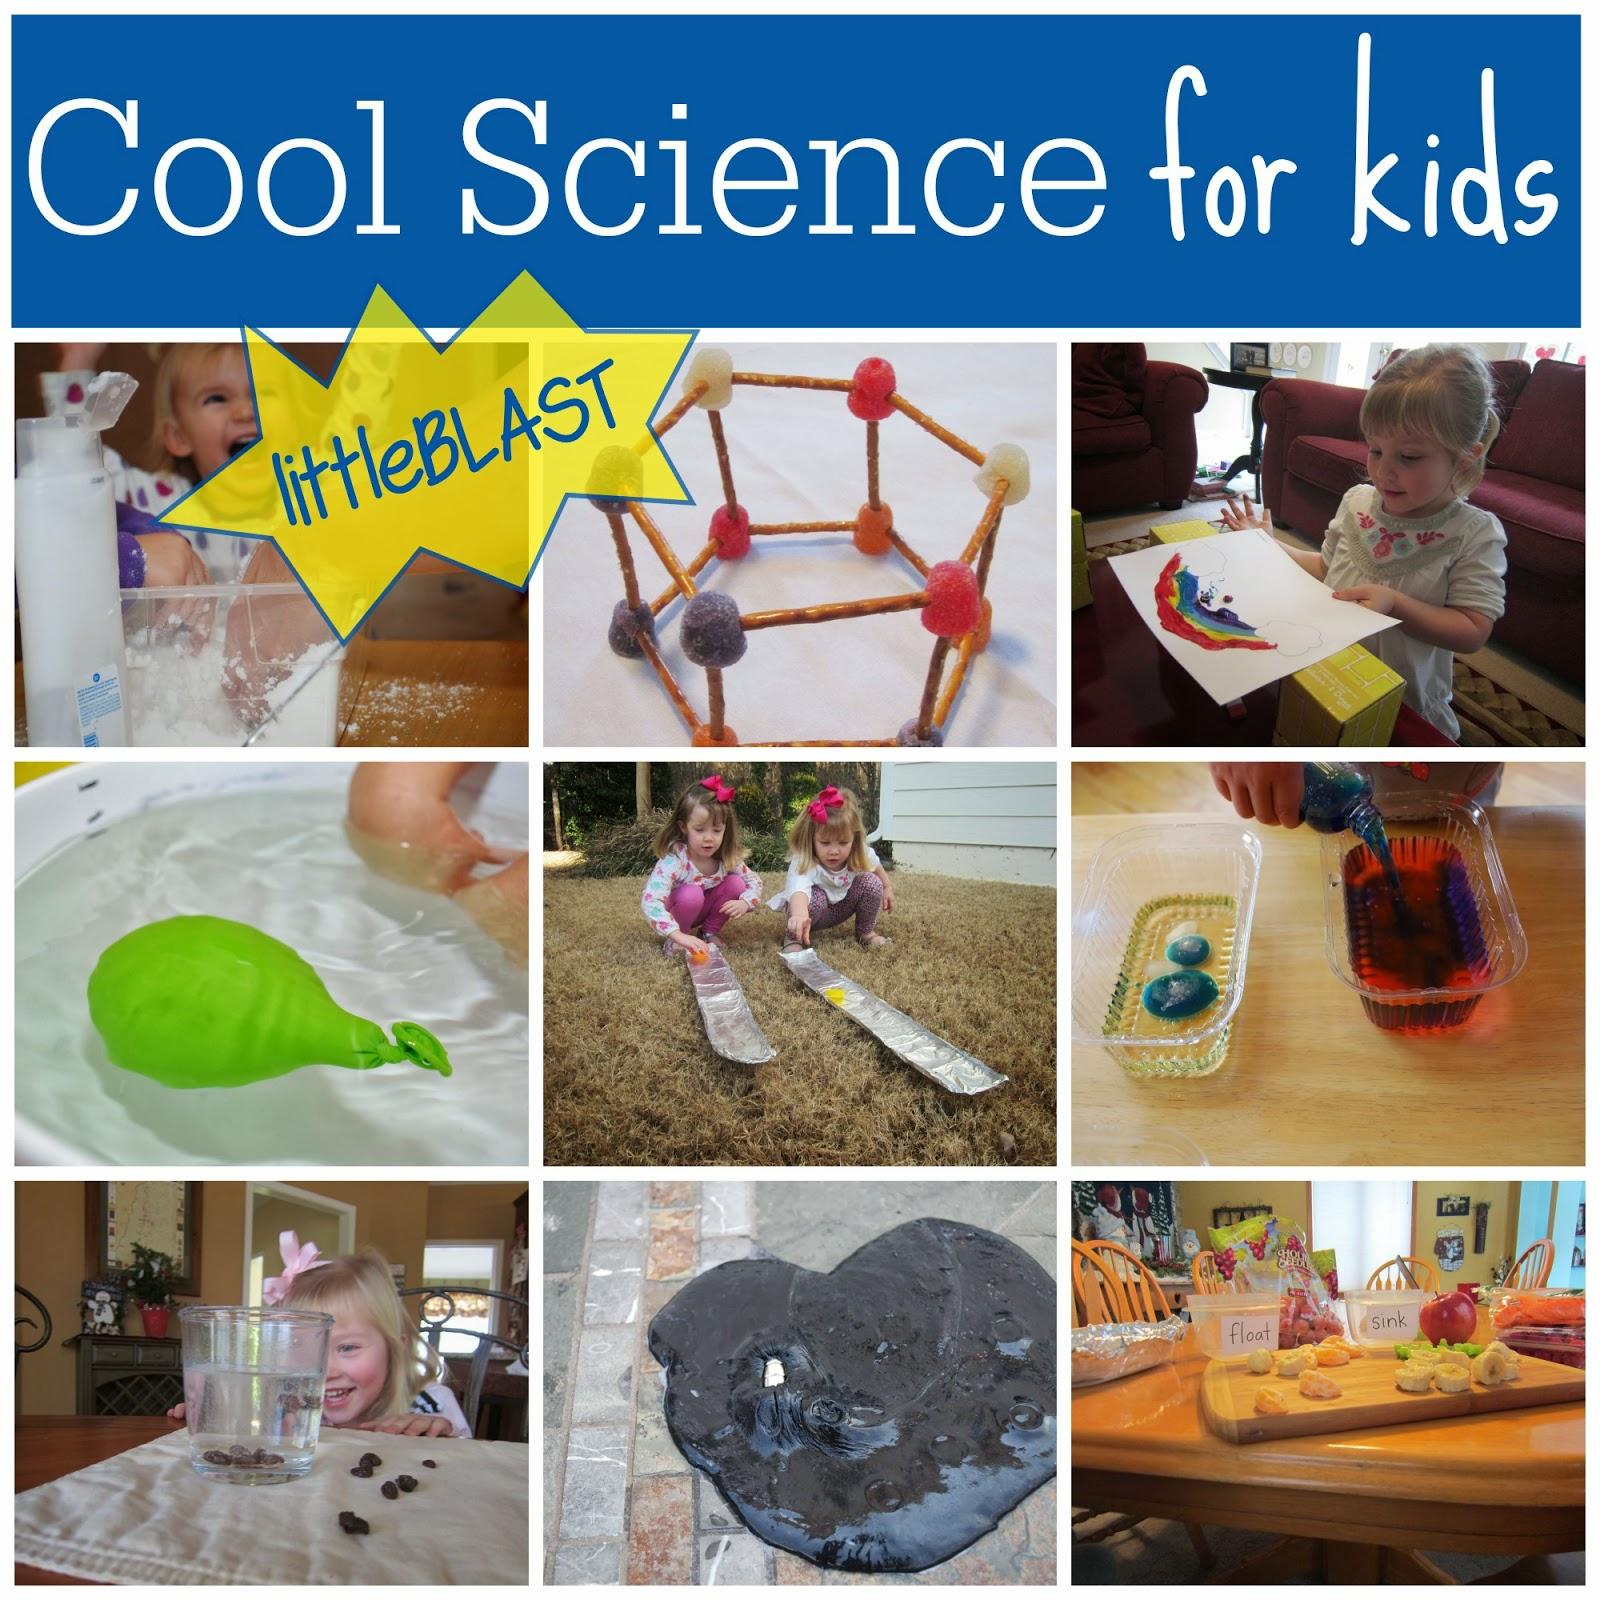 science cool blast kit giveaway toddler slime magnetic